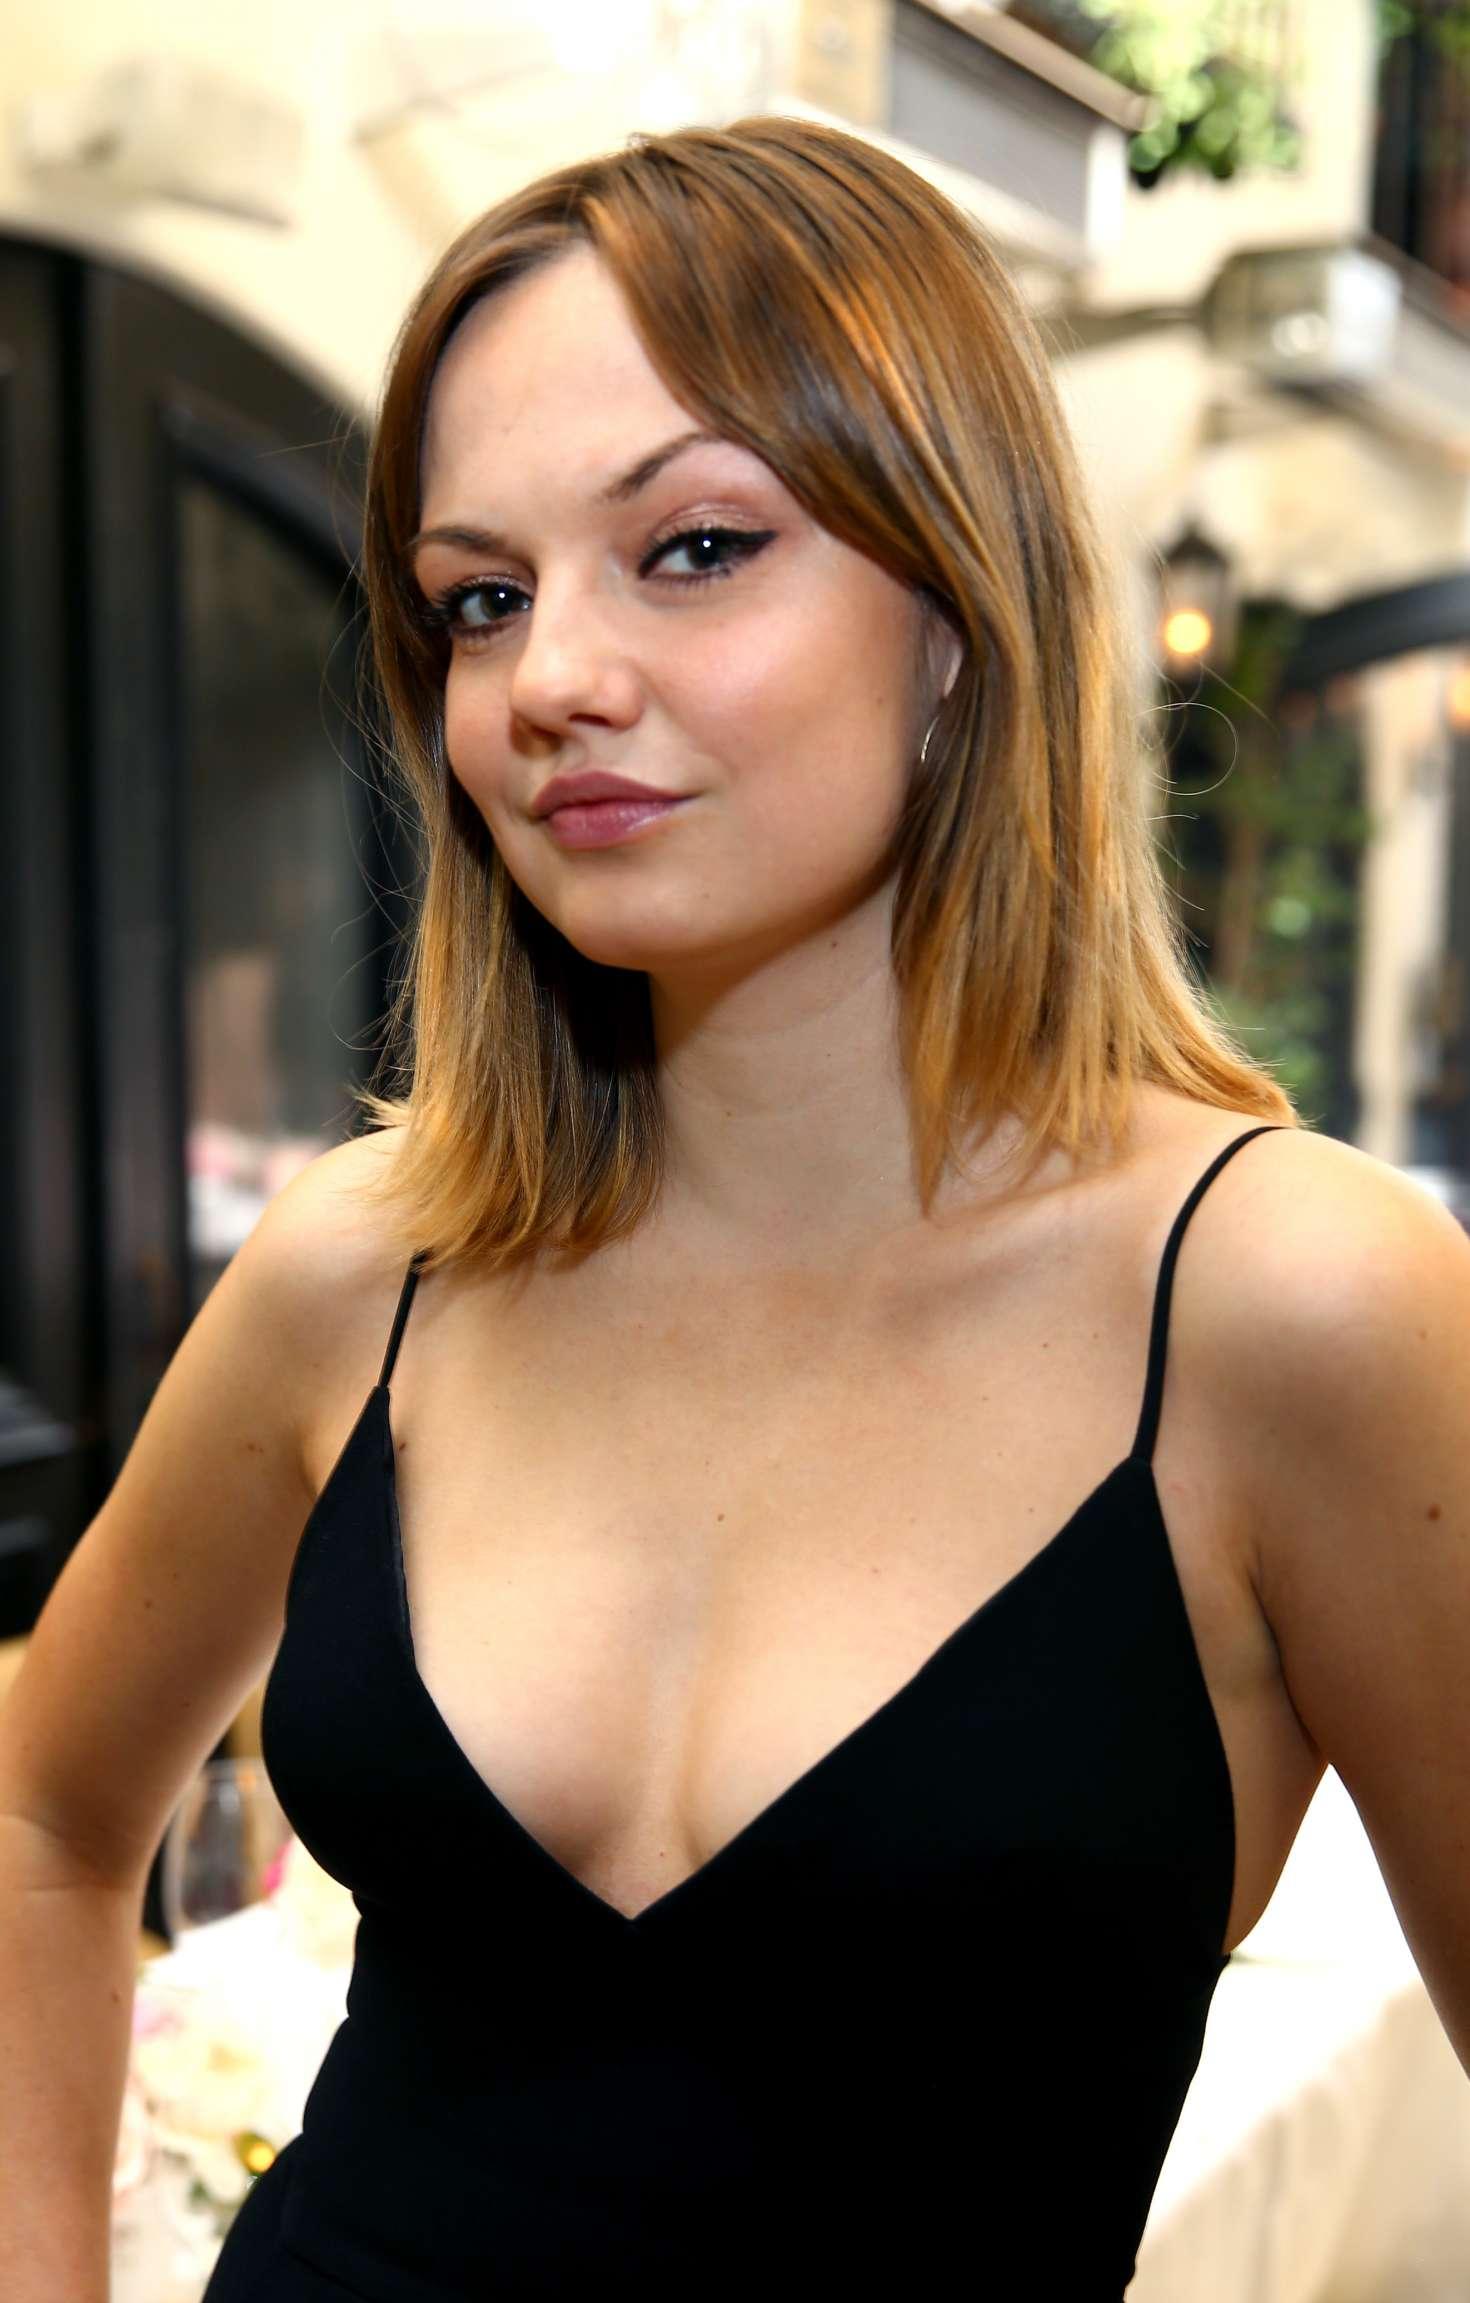 Bikini Emily Meade  nudes (93 images), iCloud, cleavage